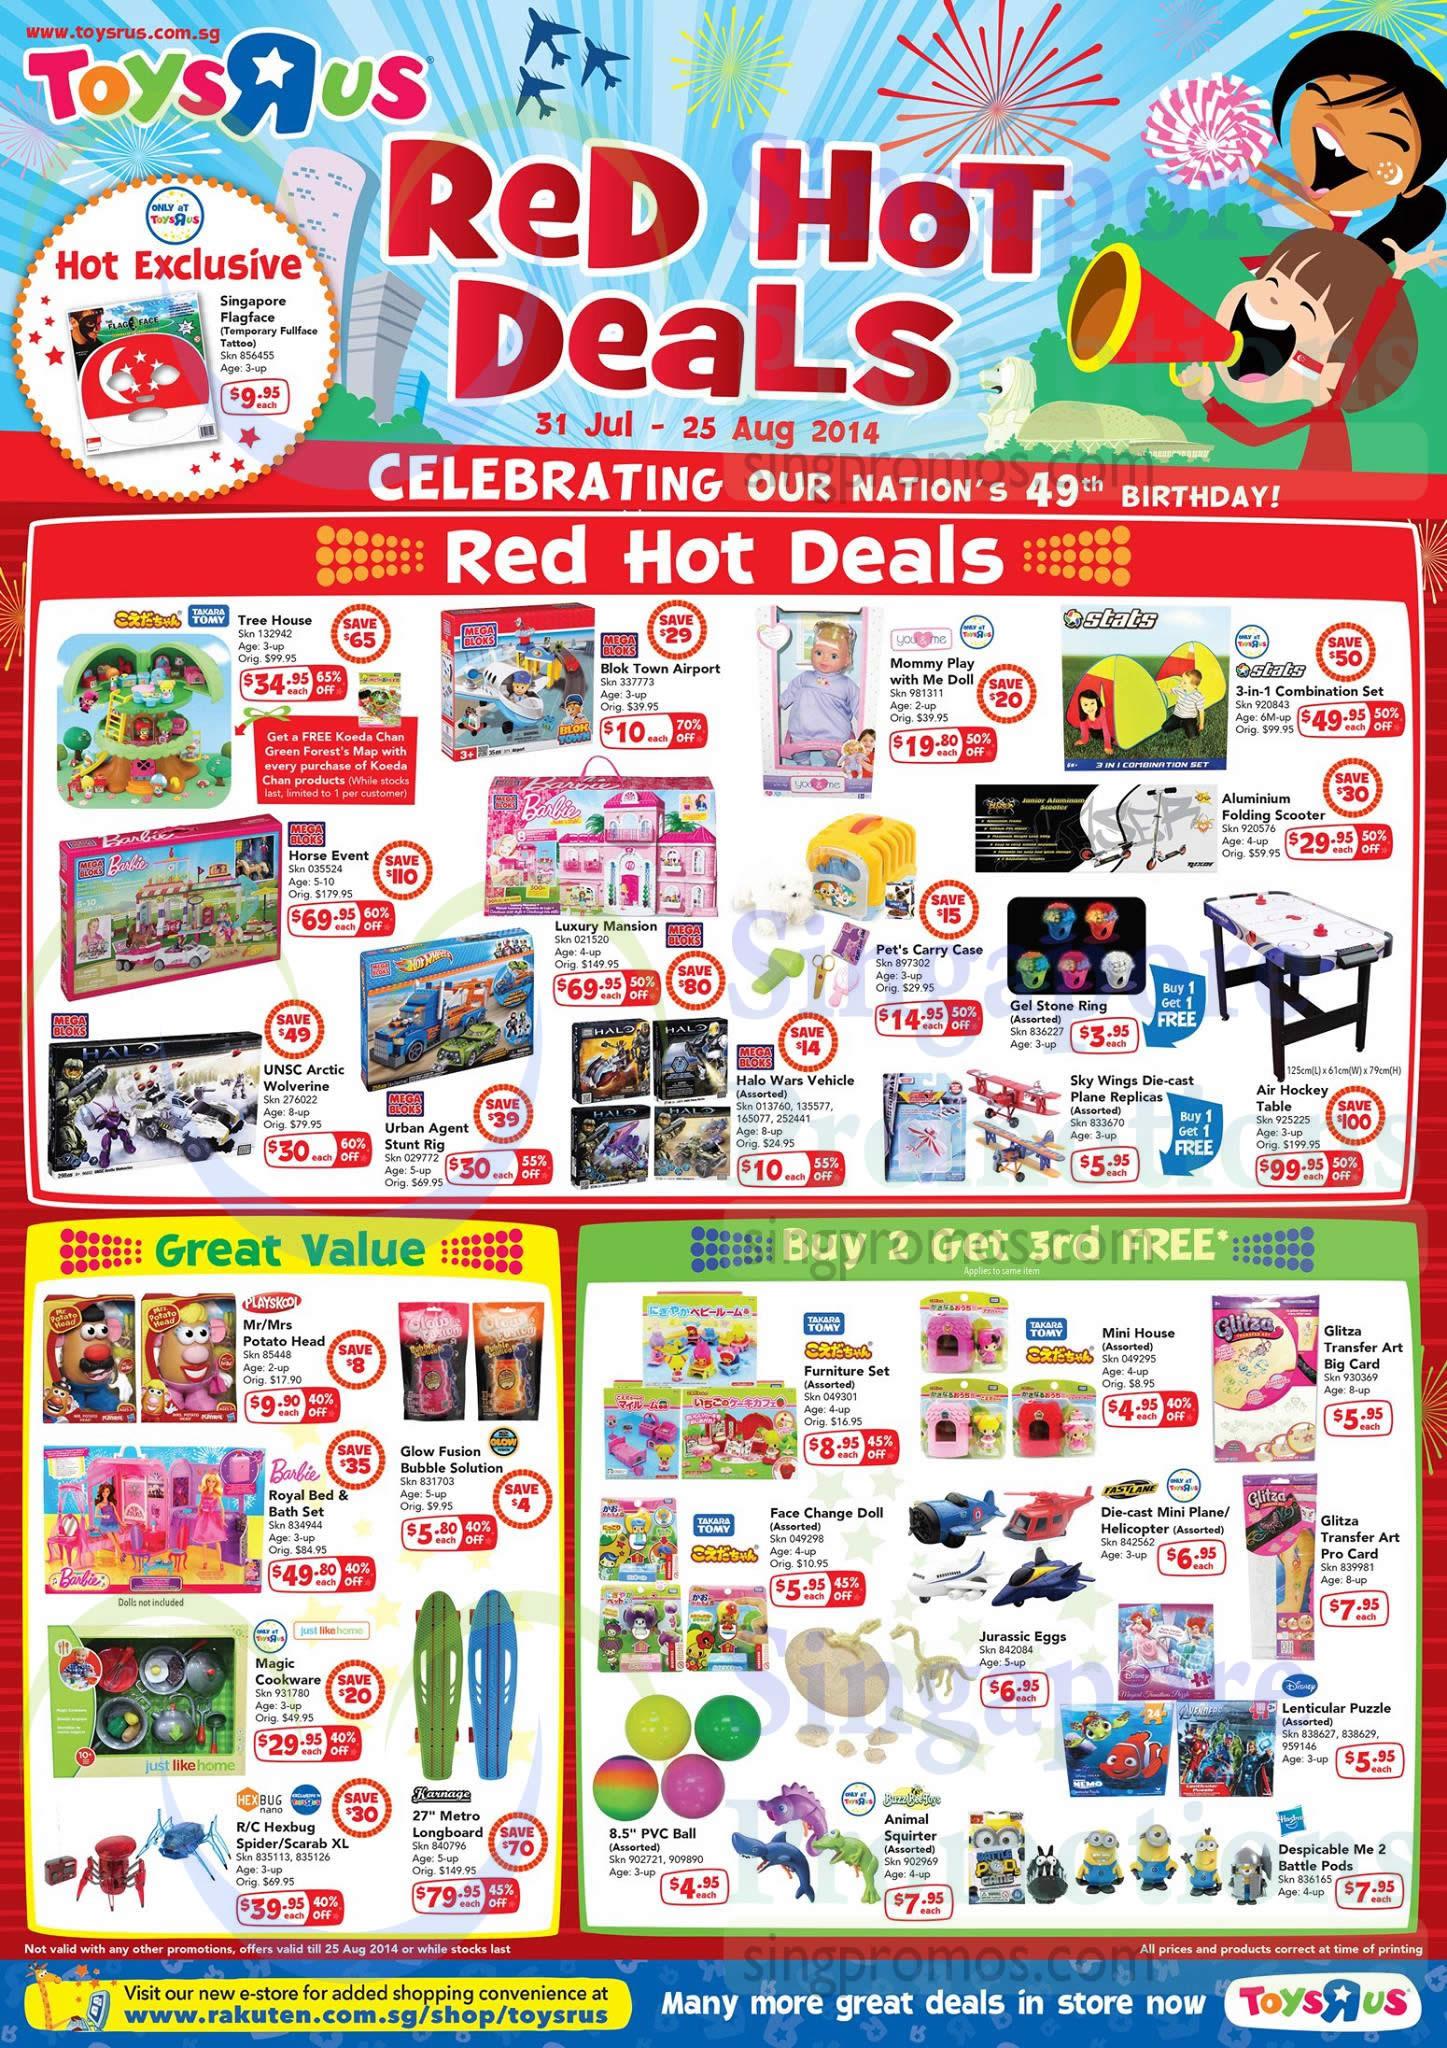 Red Hot Deals Great Value, Buy 2 Get 3 Free, Takara Tomy, Stats, Barbie, Mega Bloks, Fast Lane, Playskool, Hexbug Nano